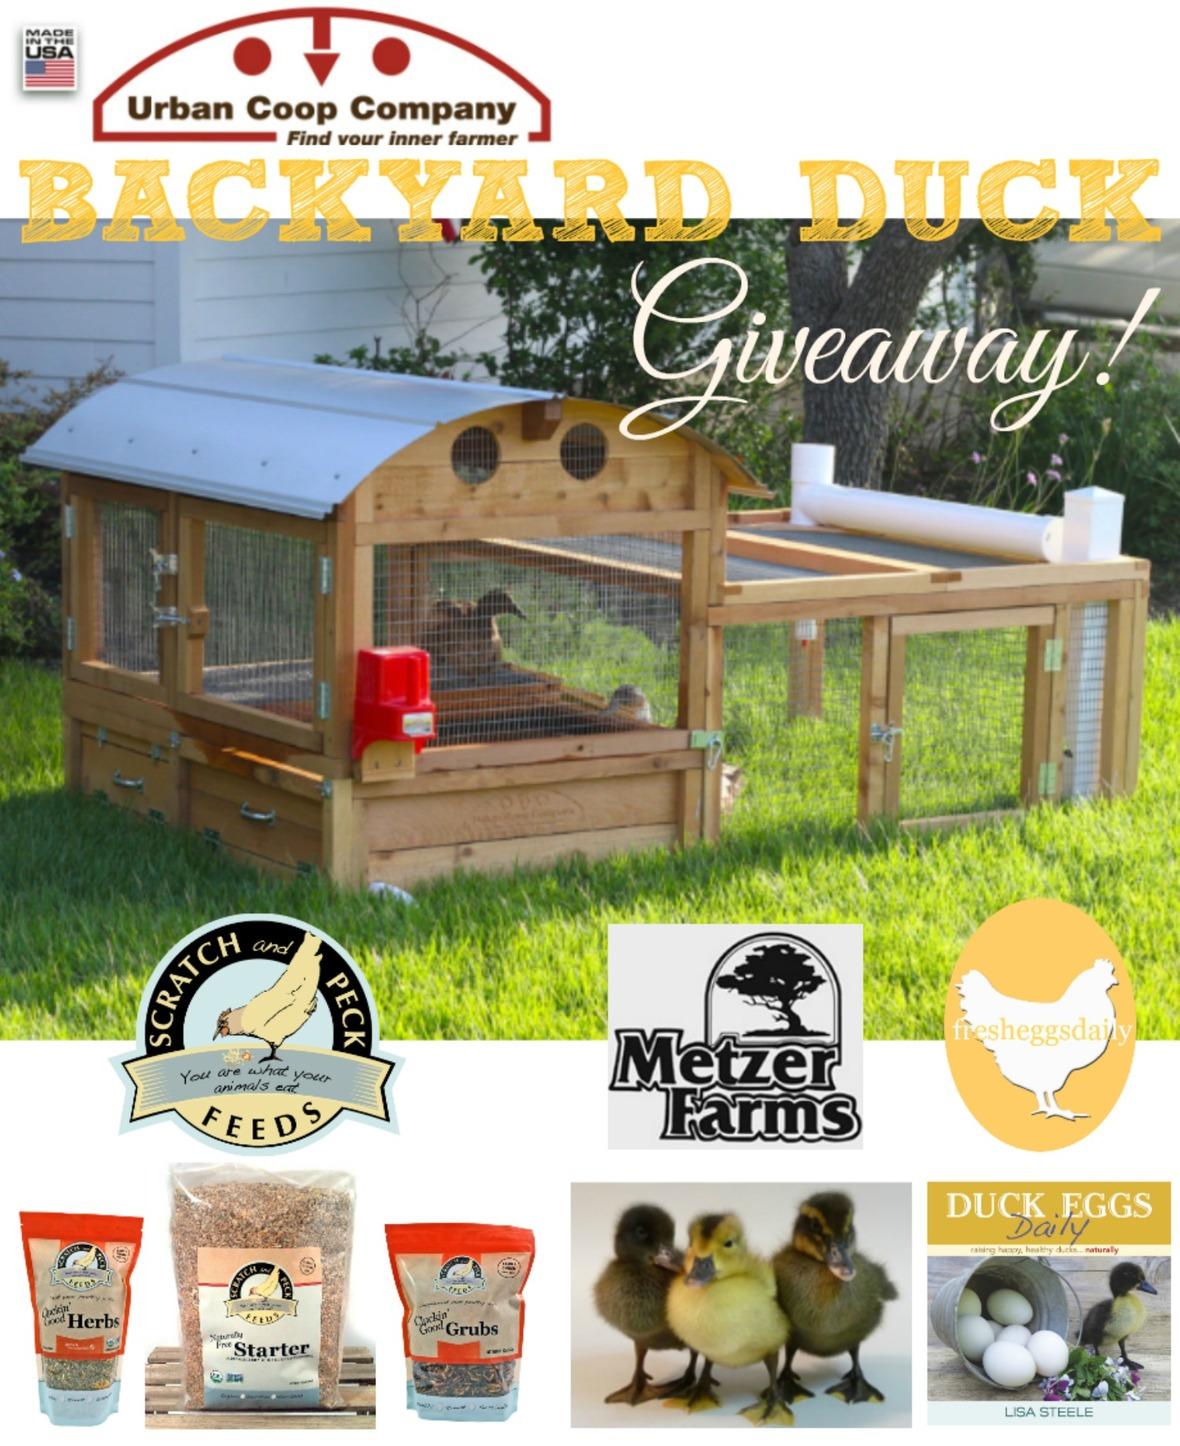 Enter The Backyard Duckapalooza Giveaway!